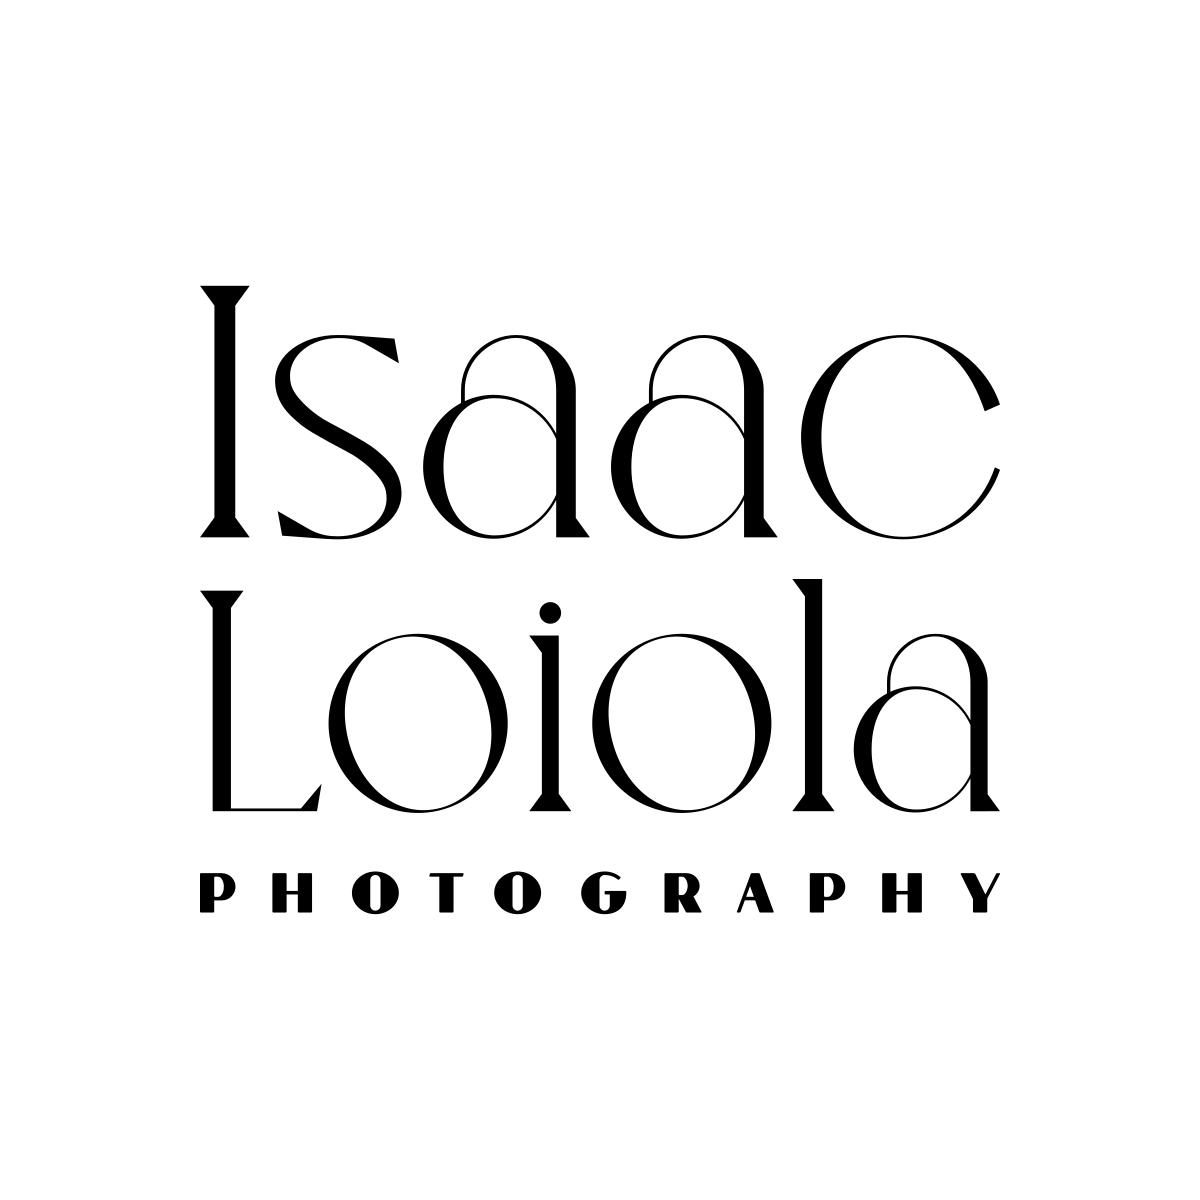 Isaac Loiola - Photography